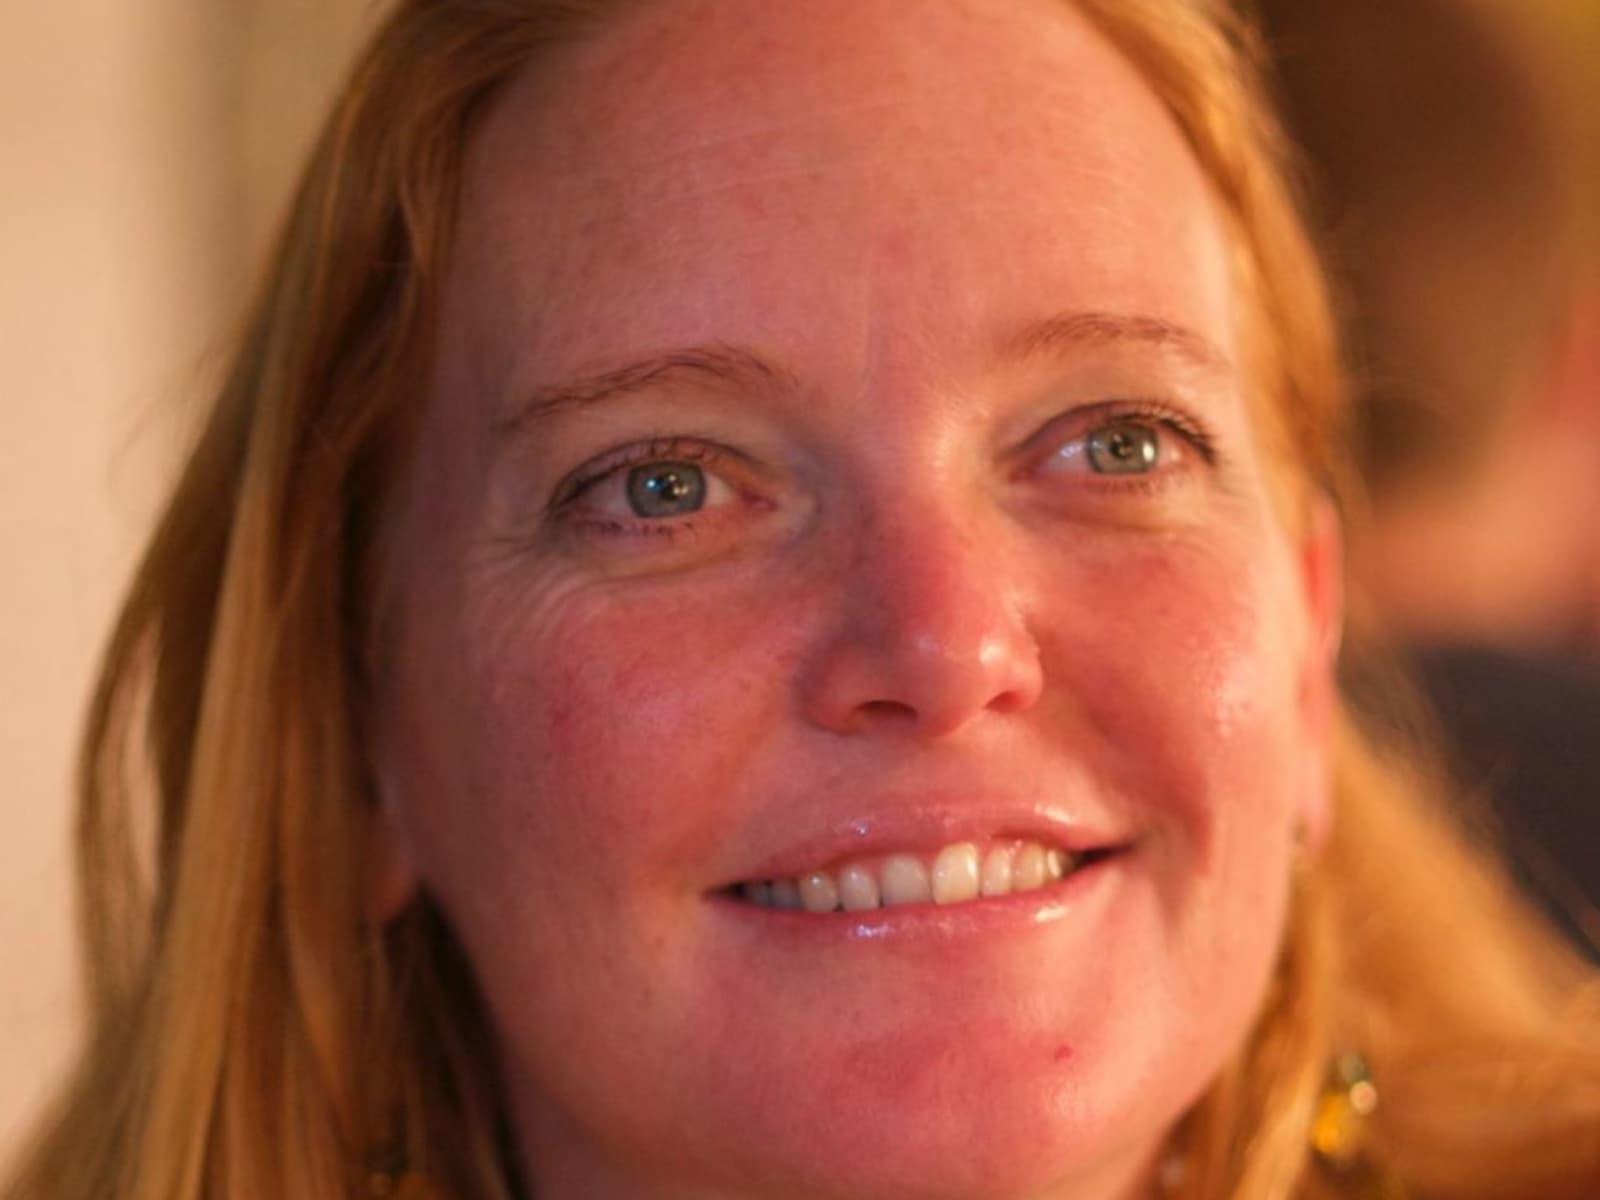 Susan from Gillingham, United Kingdom